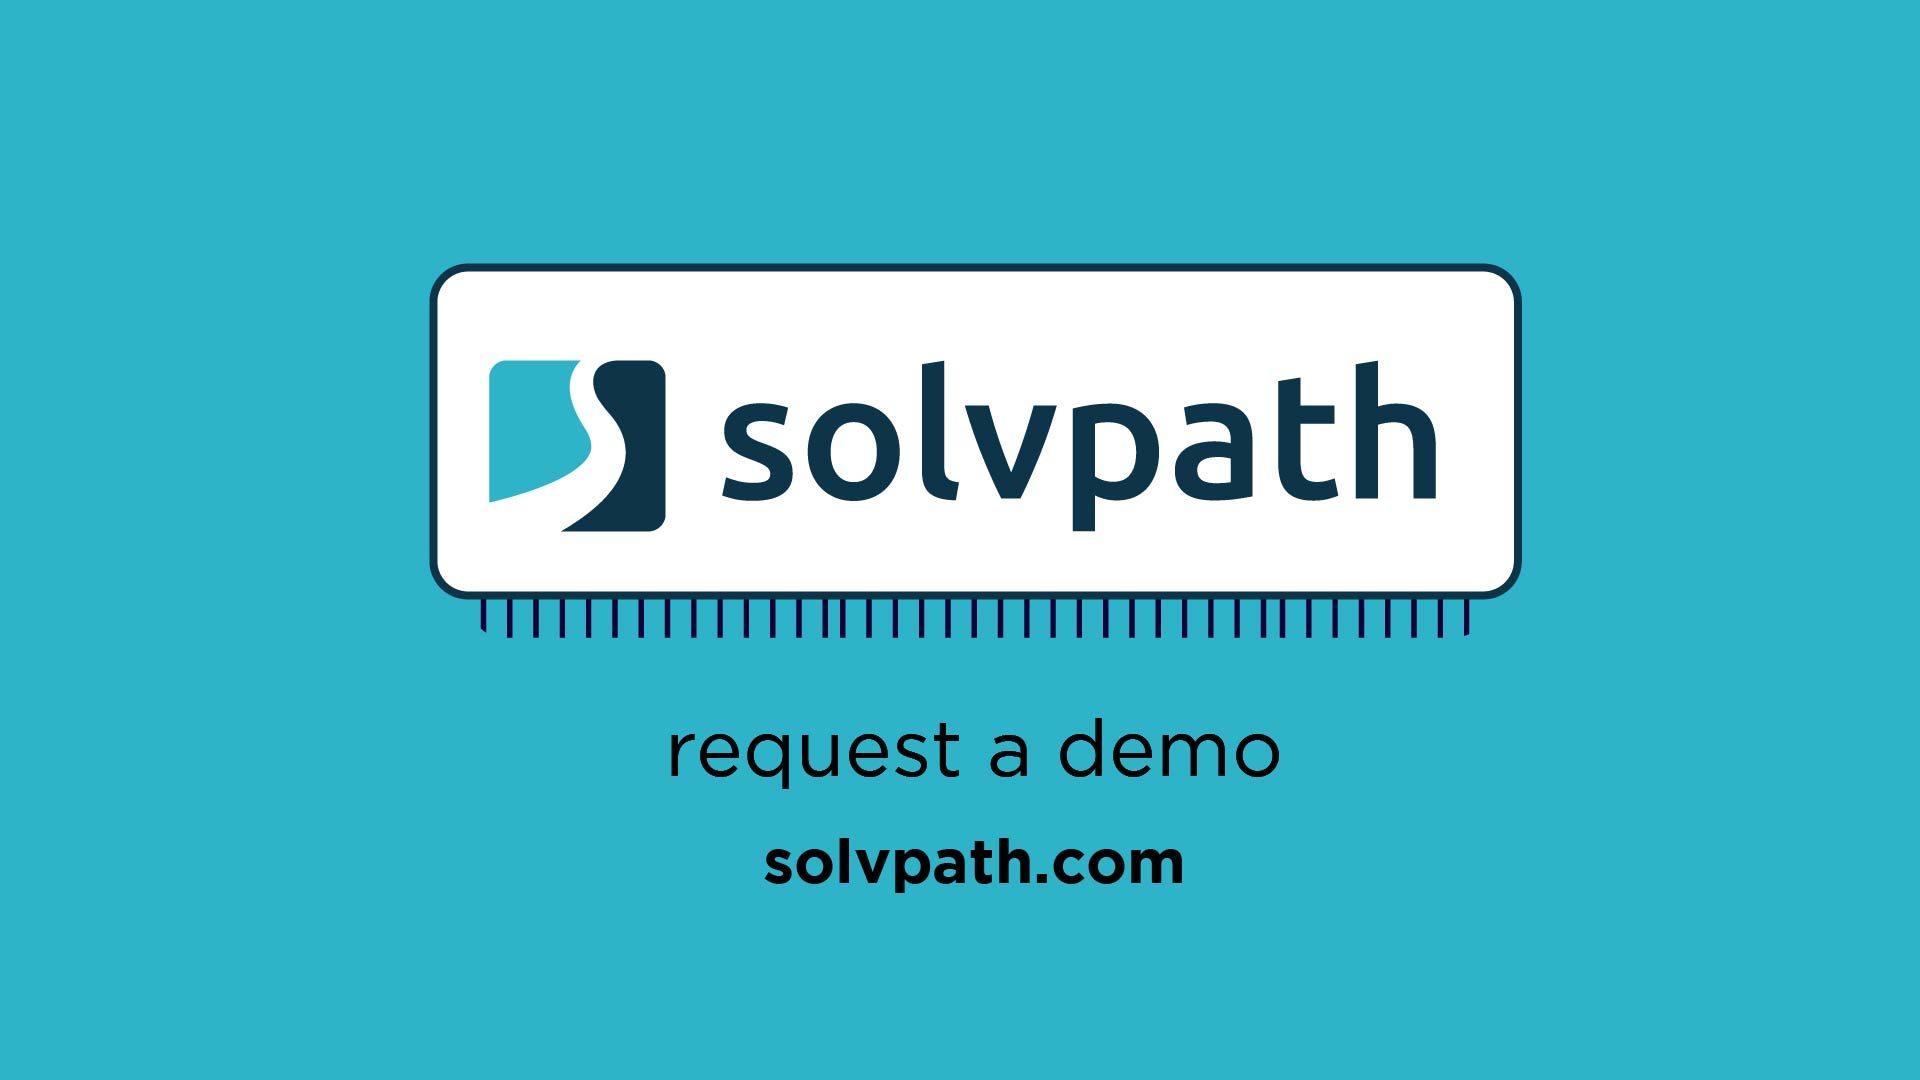 Solvpath demo video